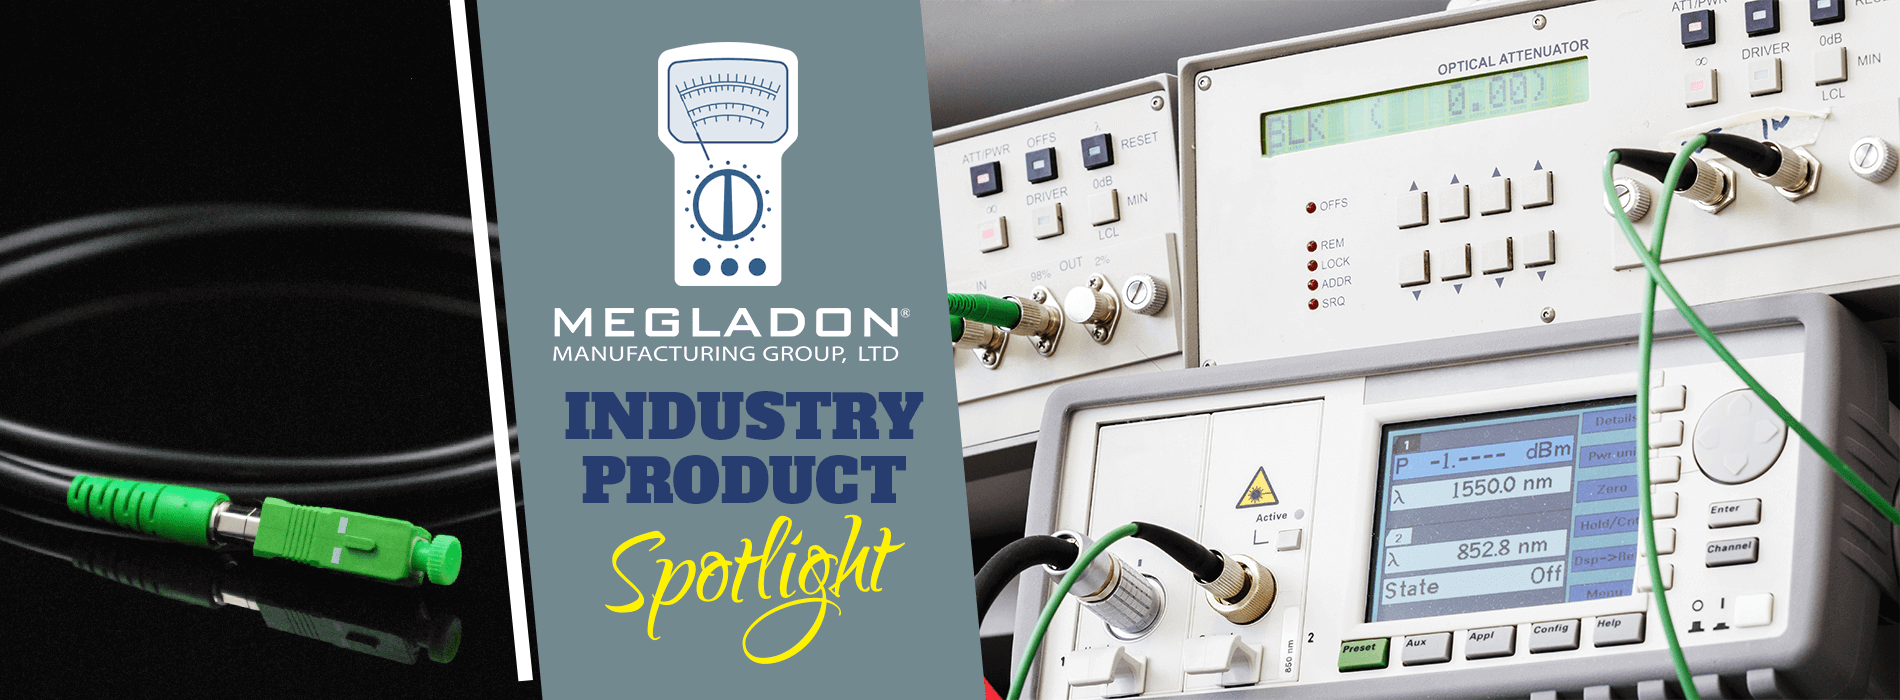 Industry Product Spotlight - Test & Measurement